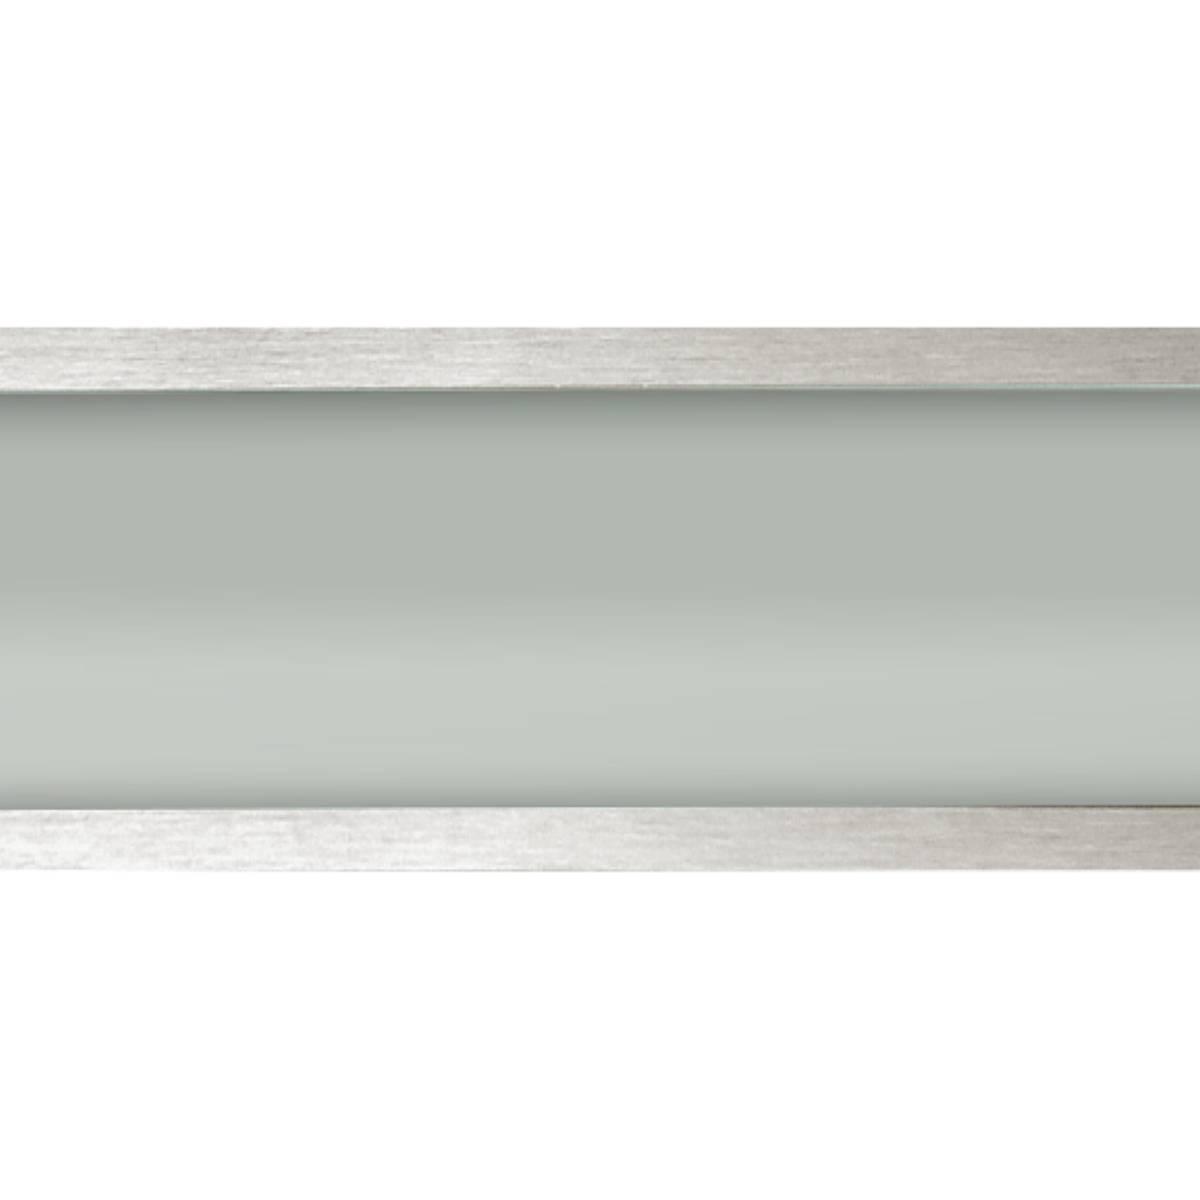 Plafon Space Emb. Ret.   75cm Alum. Vidro Fosco 2x20w Fluor.  Escovado 05 Unidades